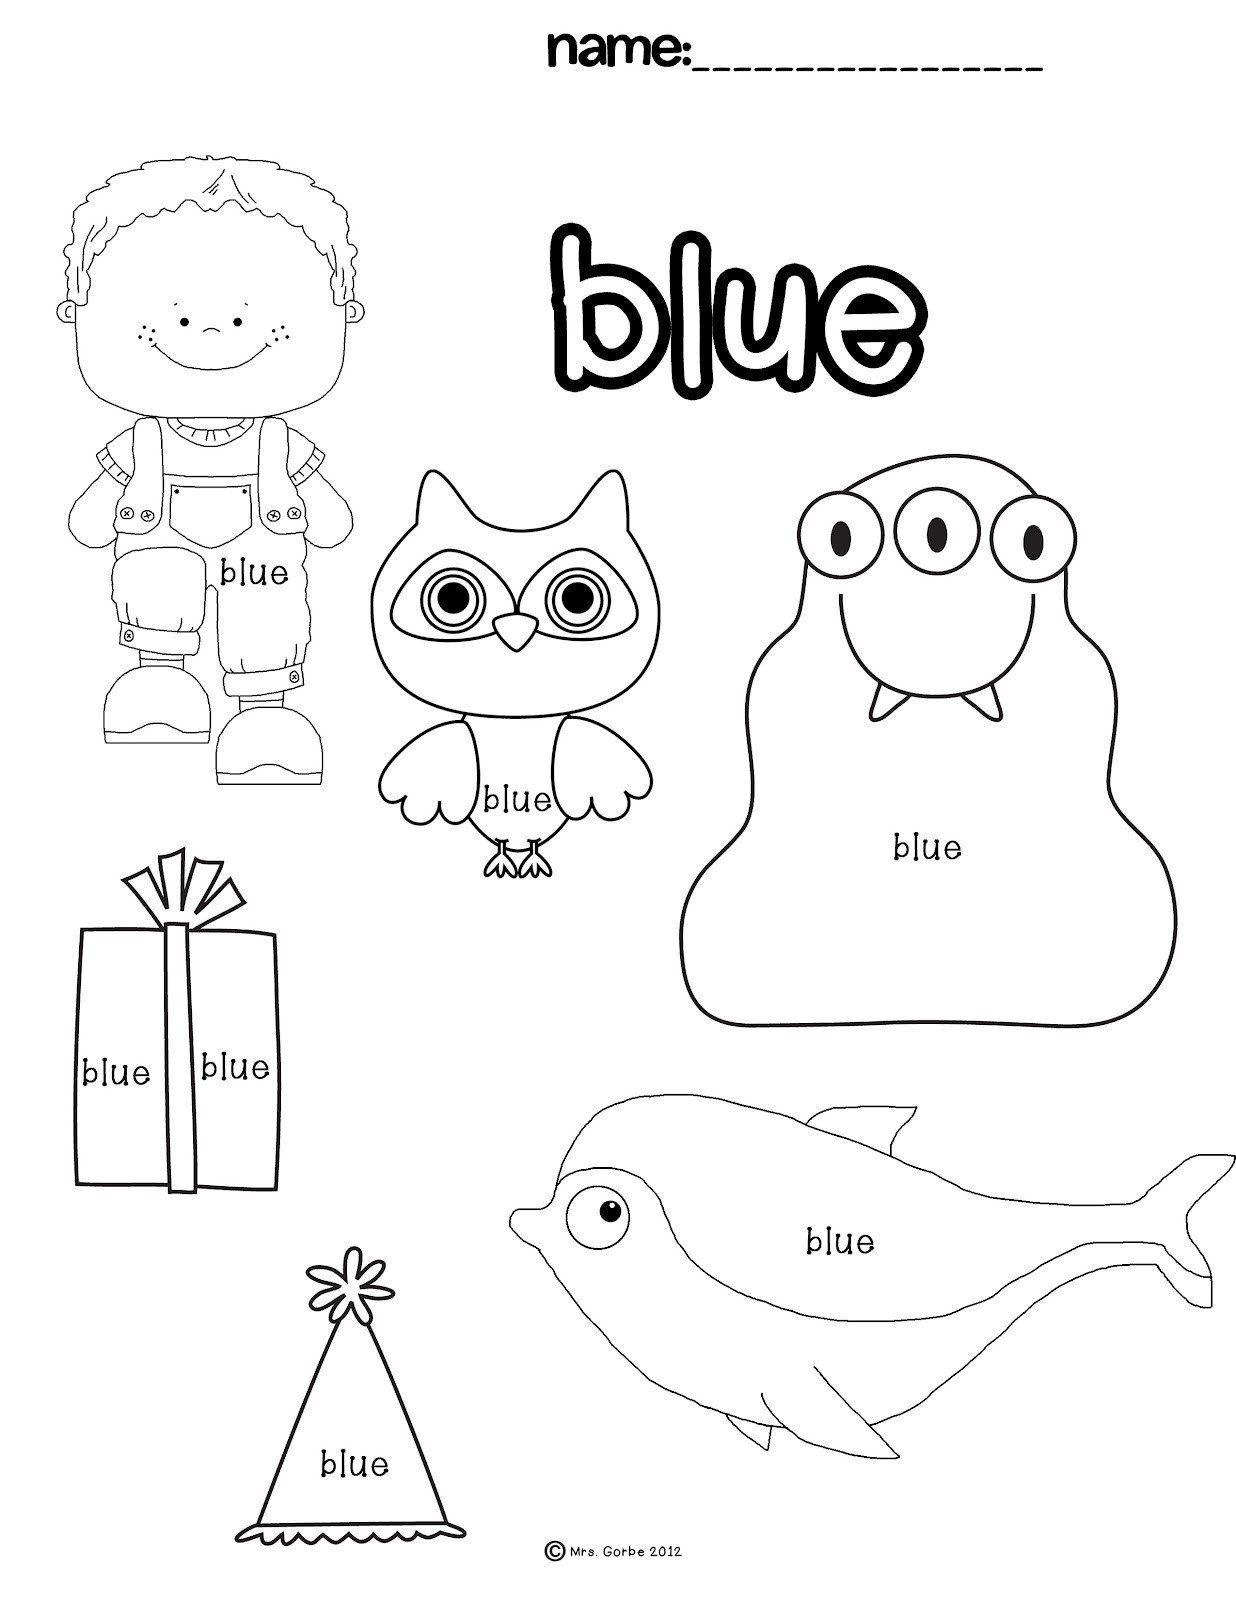 Color Blue Worksheets For Preschool A Purple Color